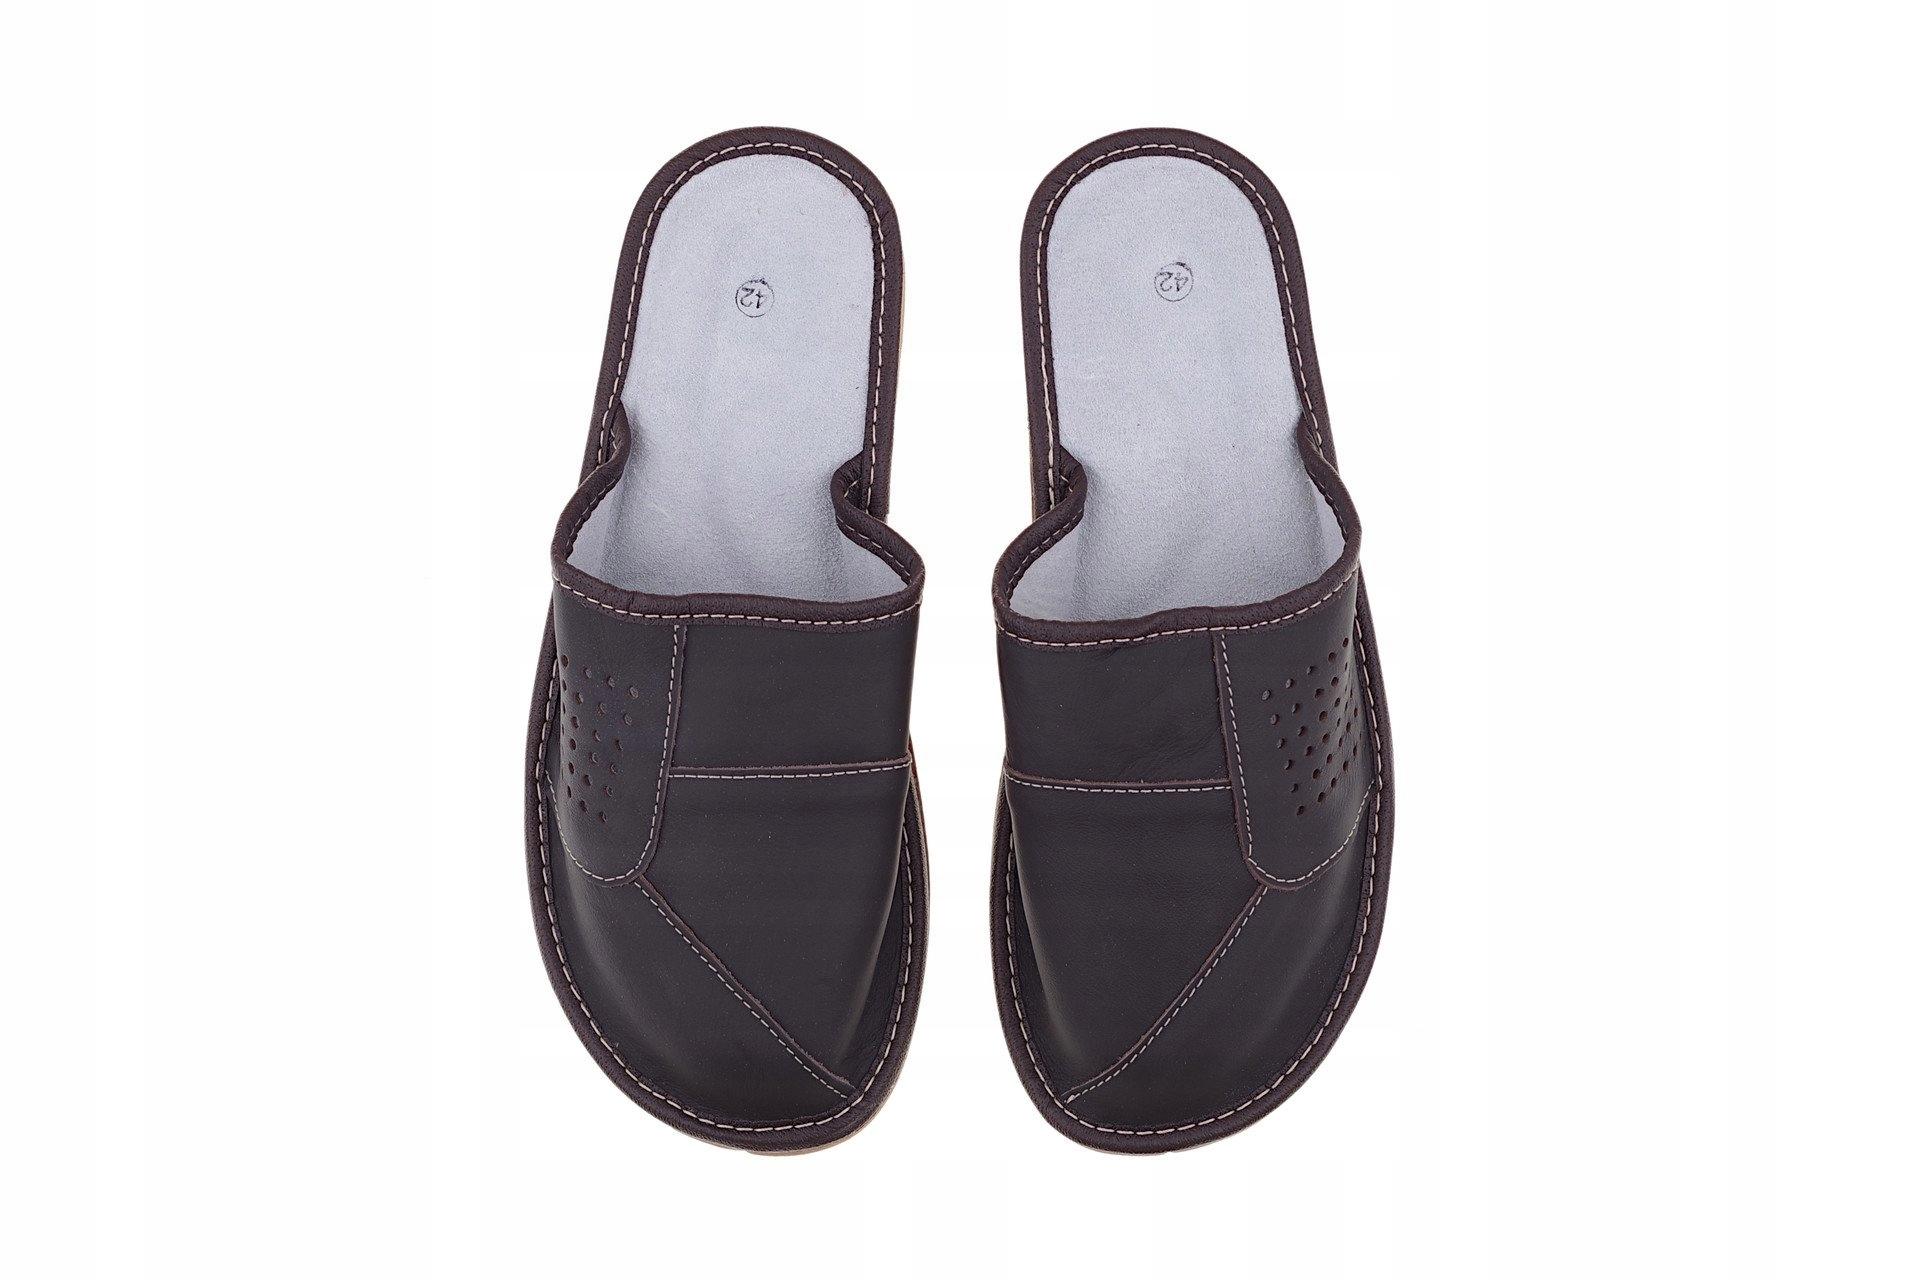 98fe6541 Kapcie skórzane pantofle męskie kryte laczki r. 43 - 7464126368 ...